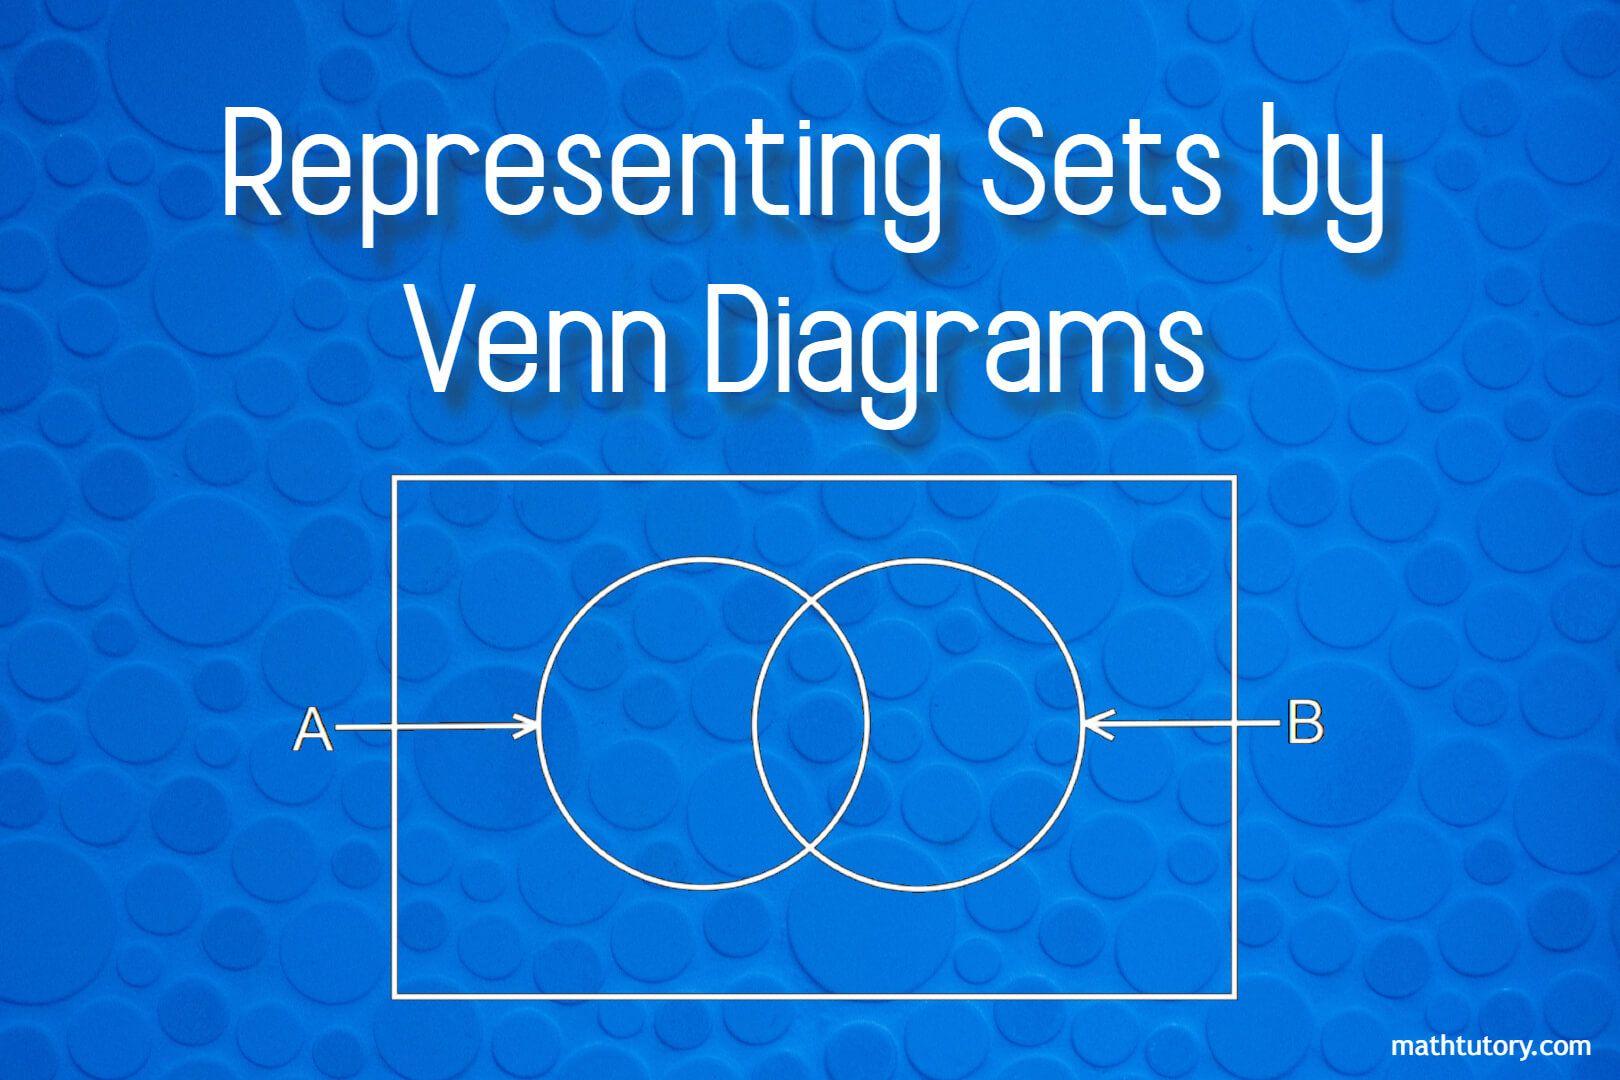 Representing Sets by Venn Diagrams